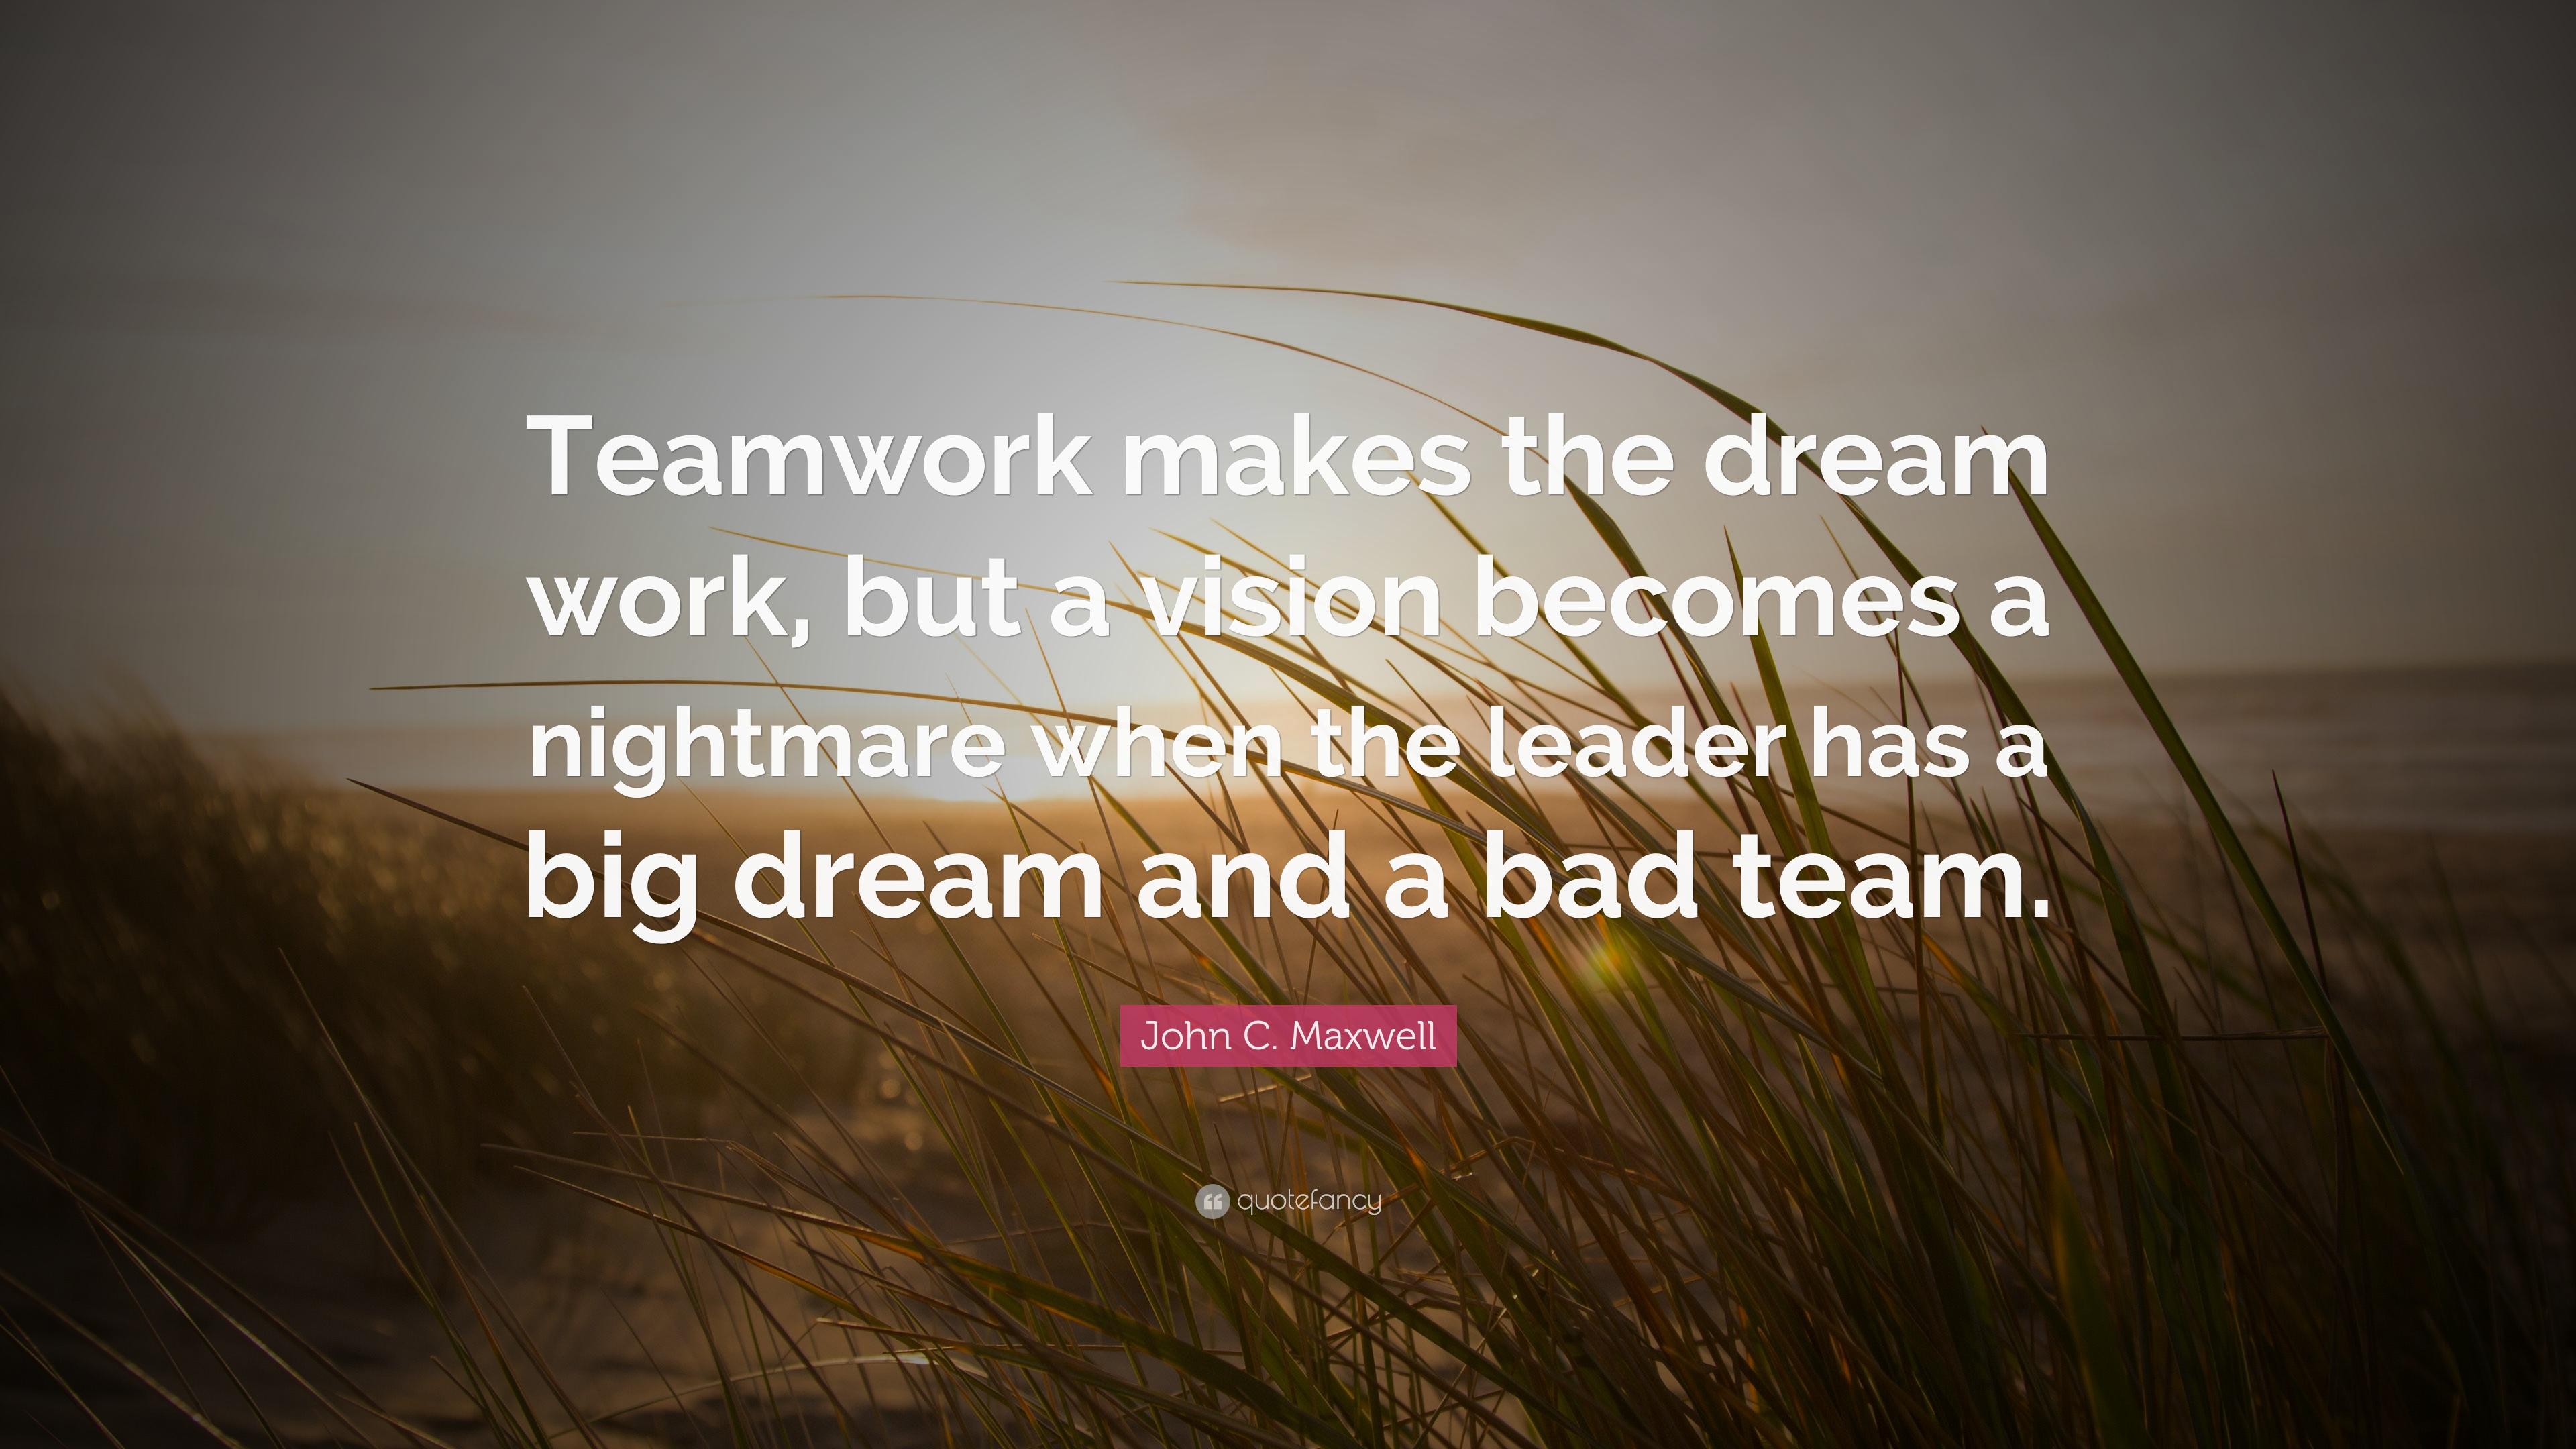 John Maxwell Quotes On Teamwork Pinterest thumbnail